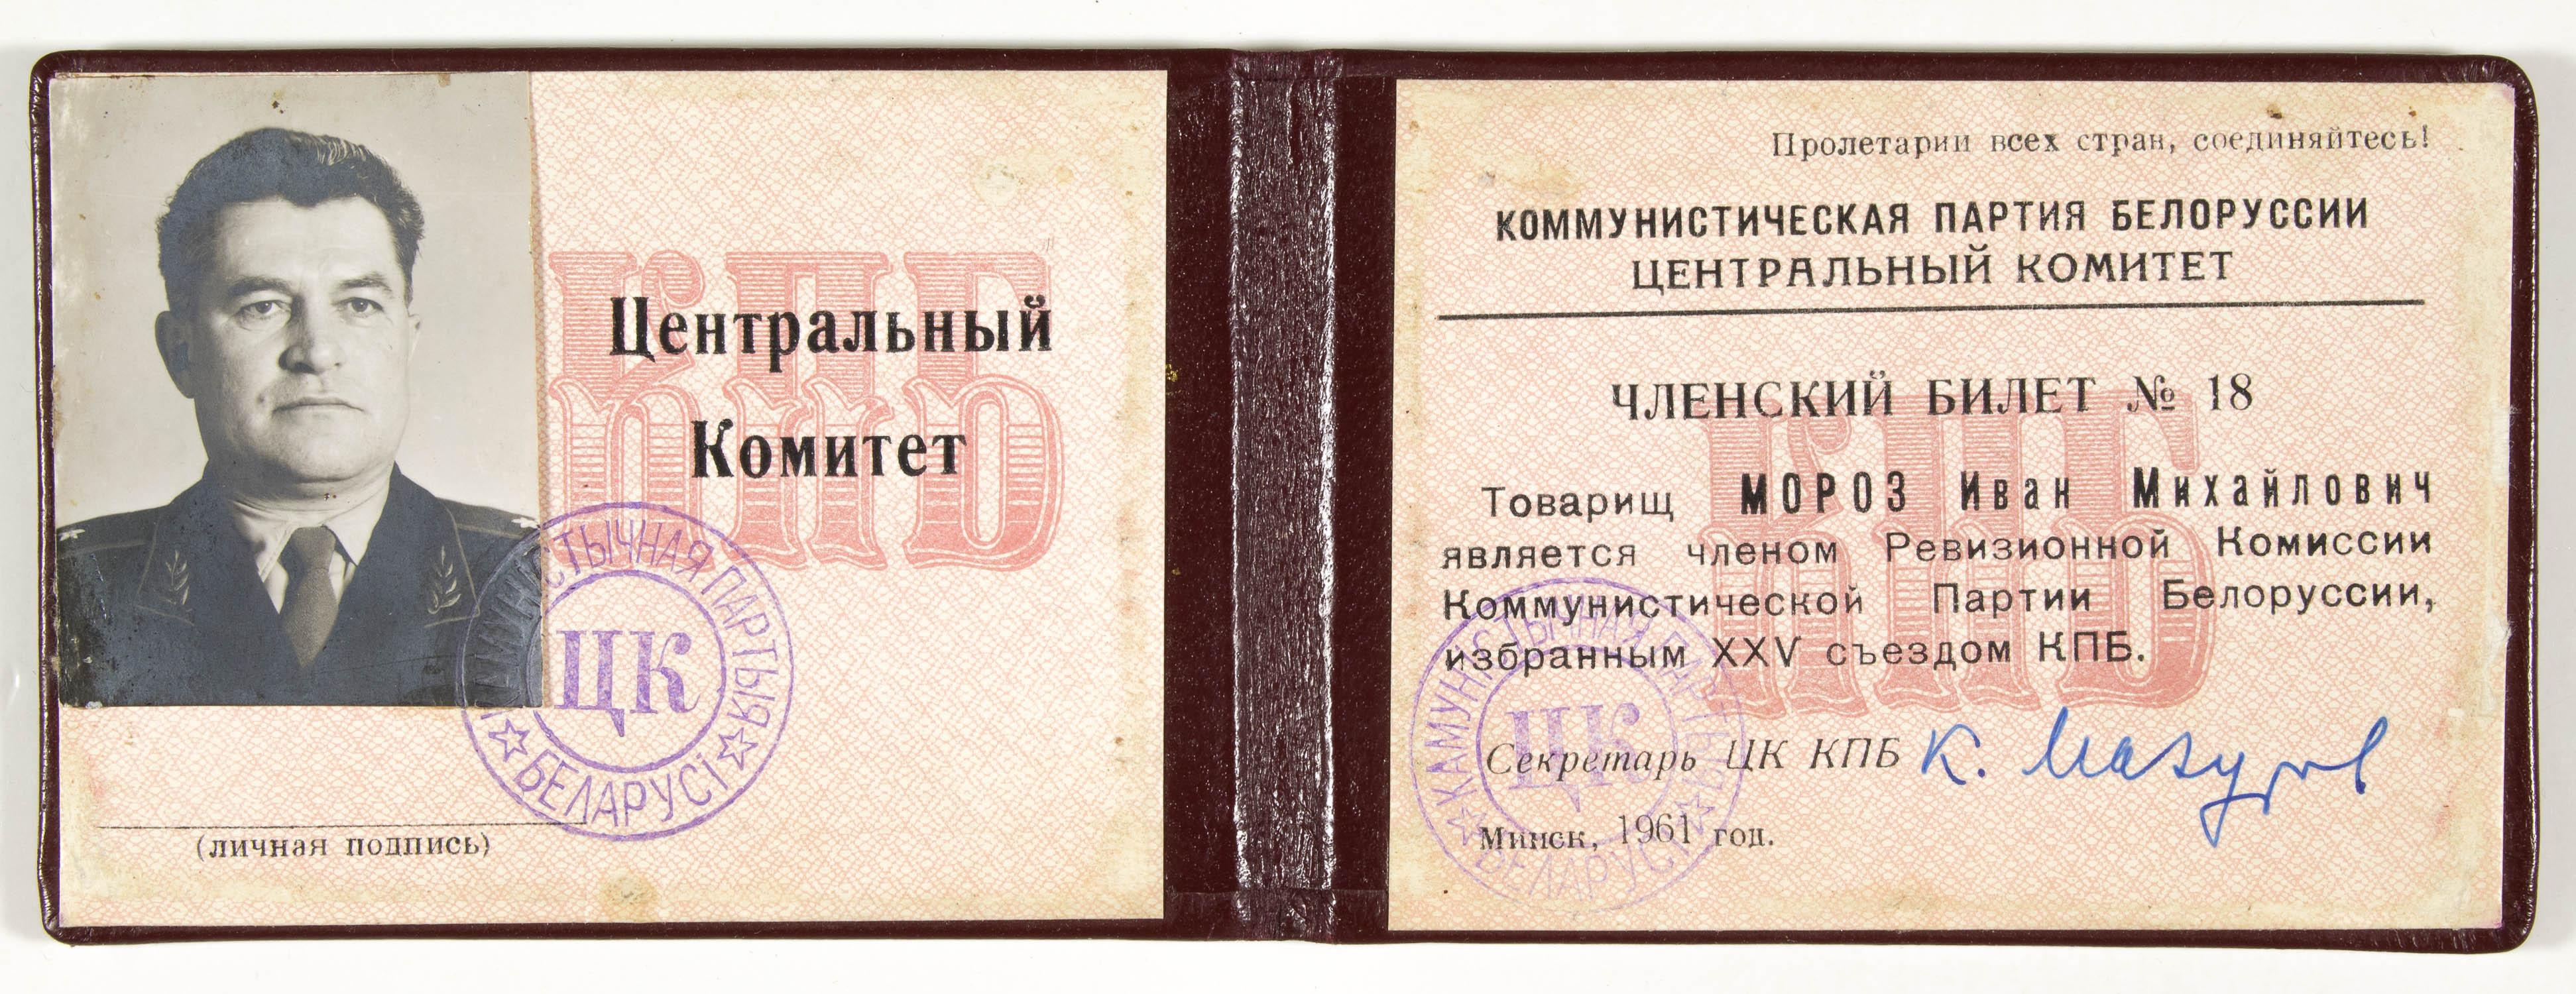 GENERAL MOROZ'S HIGH-RANKING SOVIET I.D. CARD